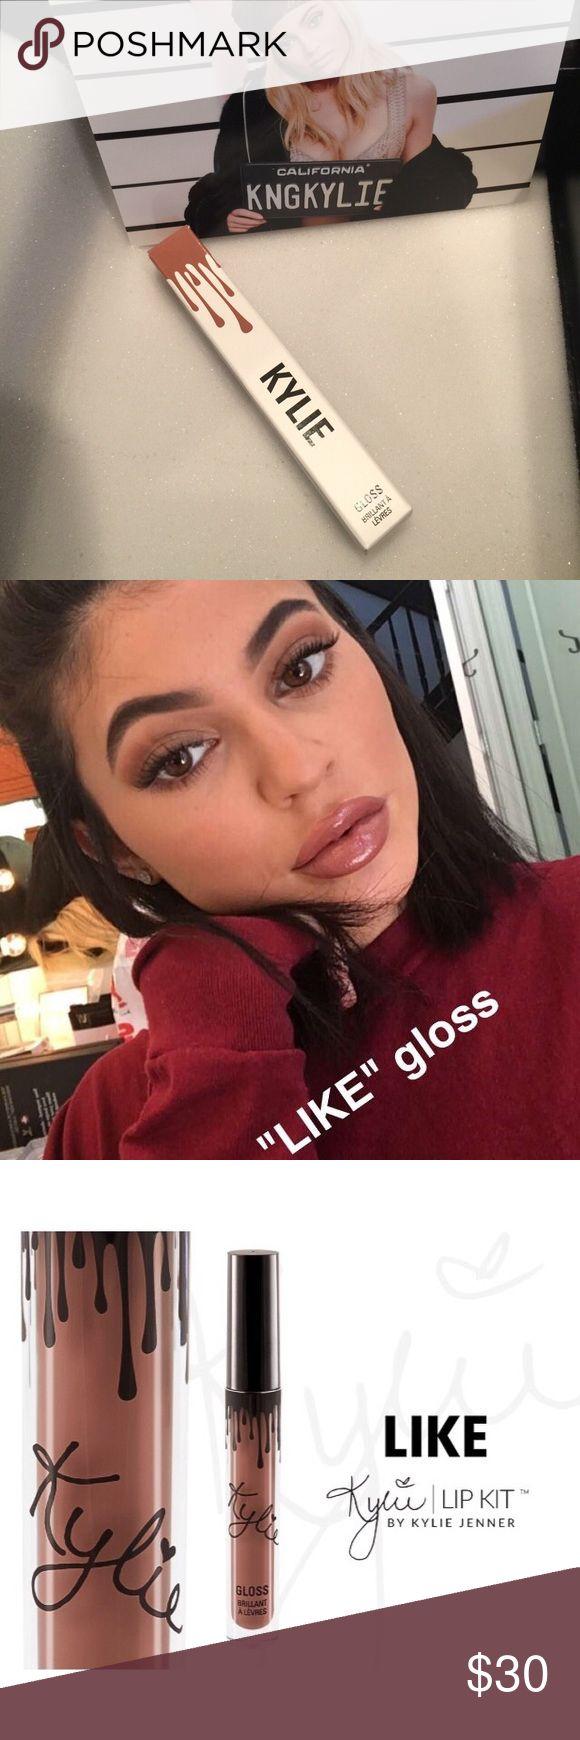 Price Drop☀️Kylie Like Lip Gloss NWT